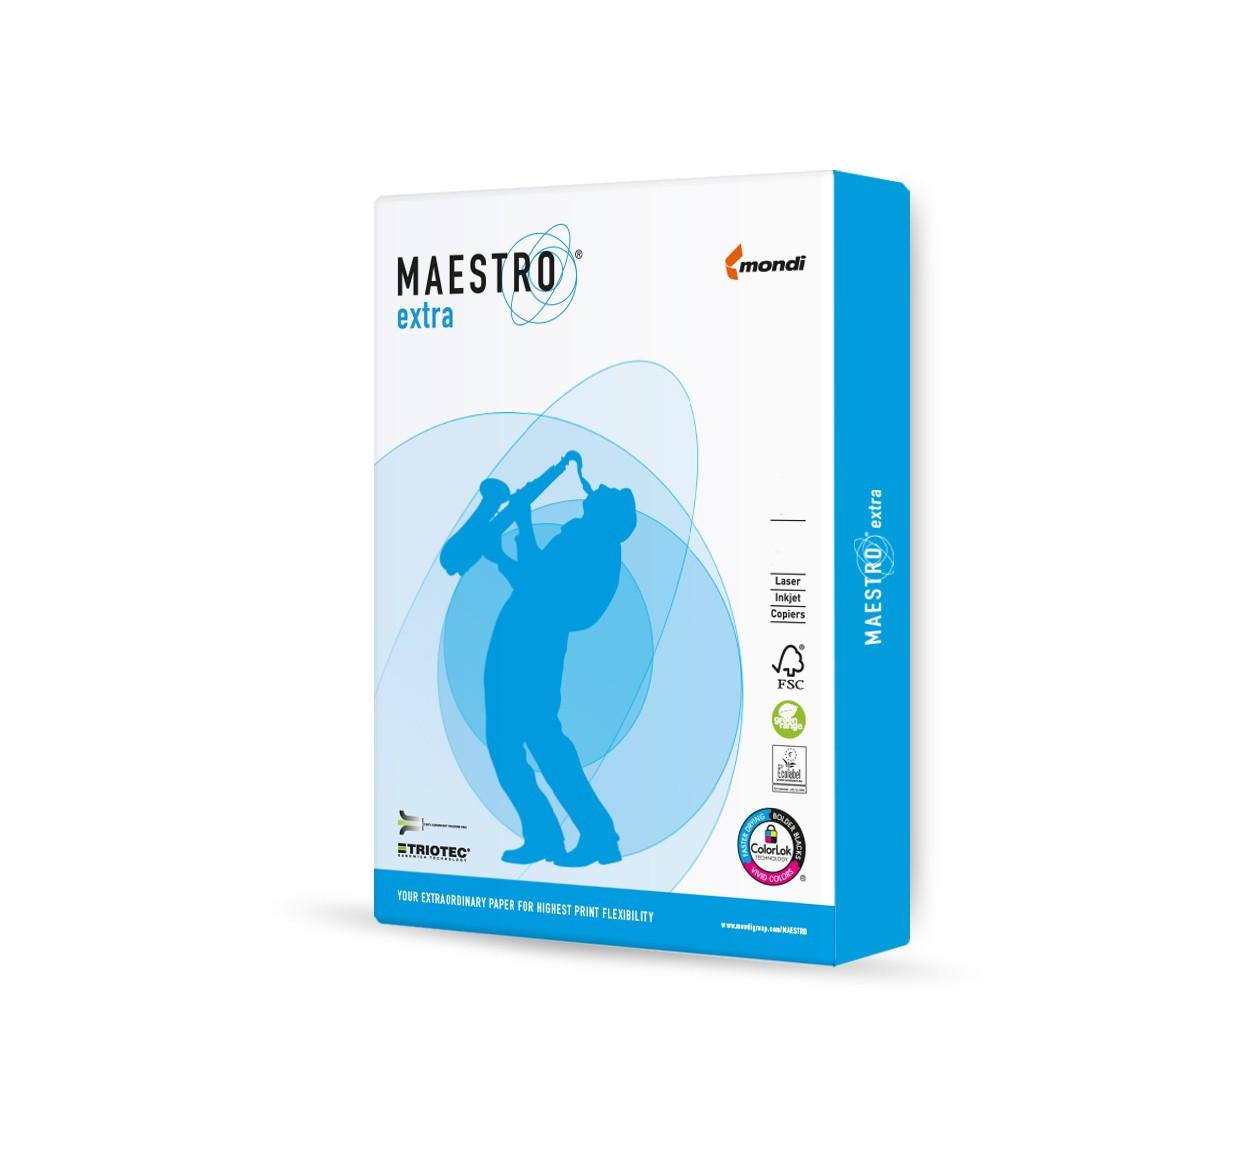 Maestro Extra 250g/m² Papier 150 Blatt DIN-A4 weiß